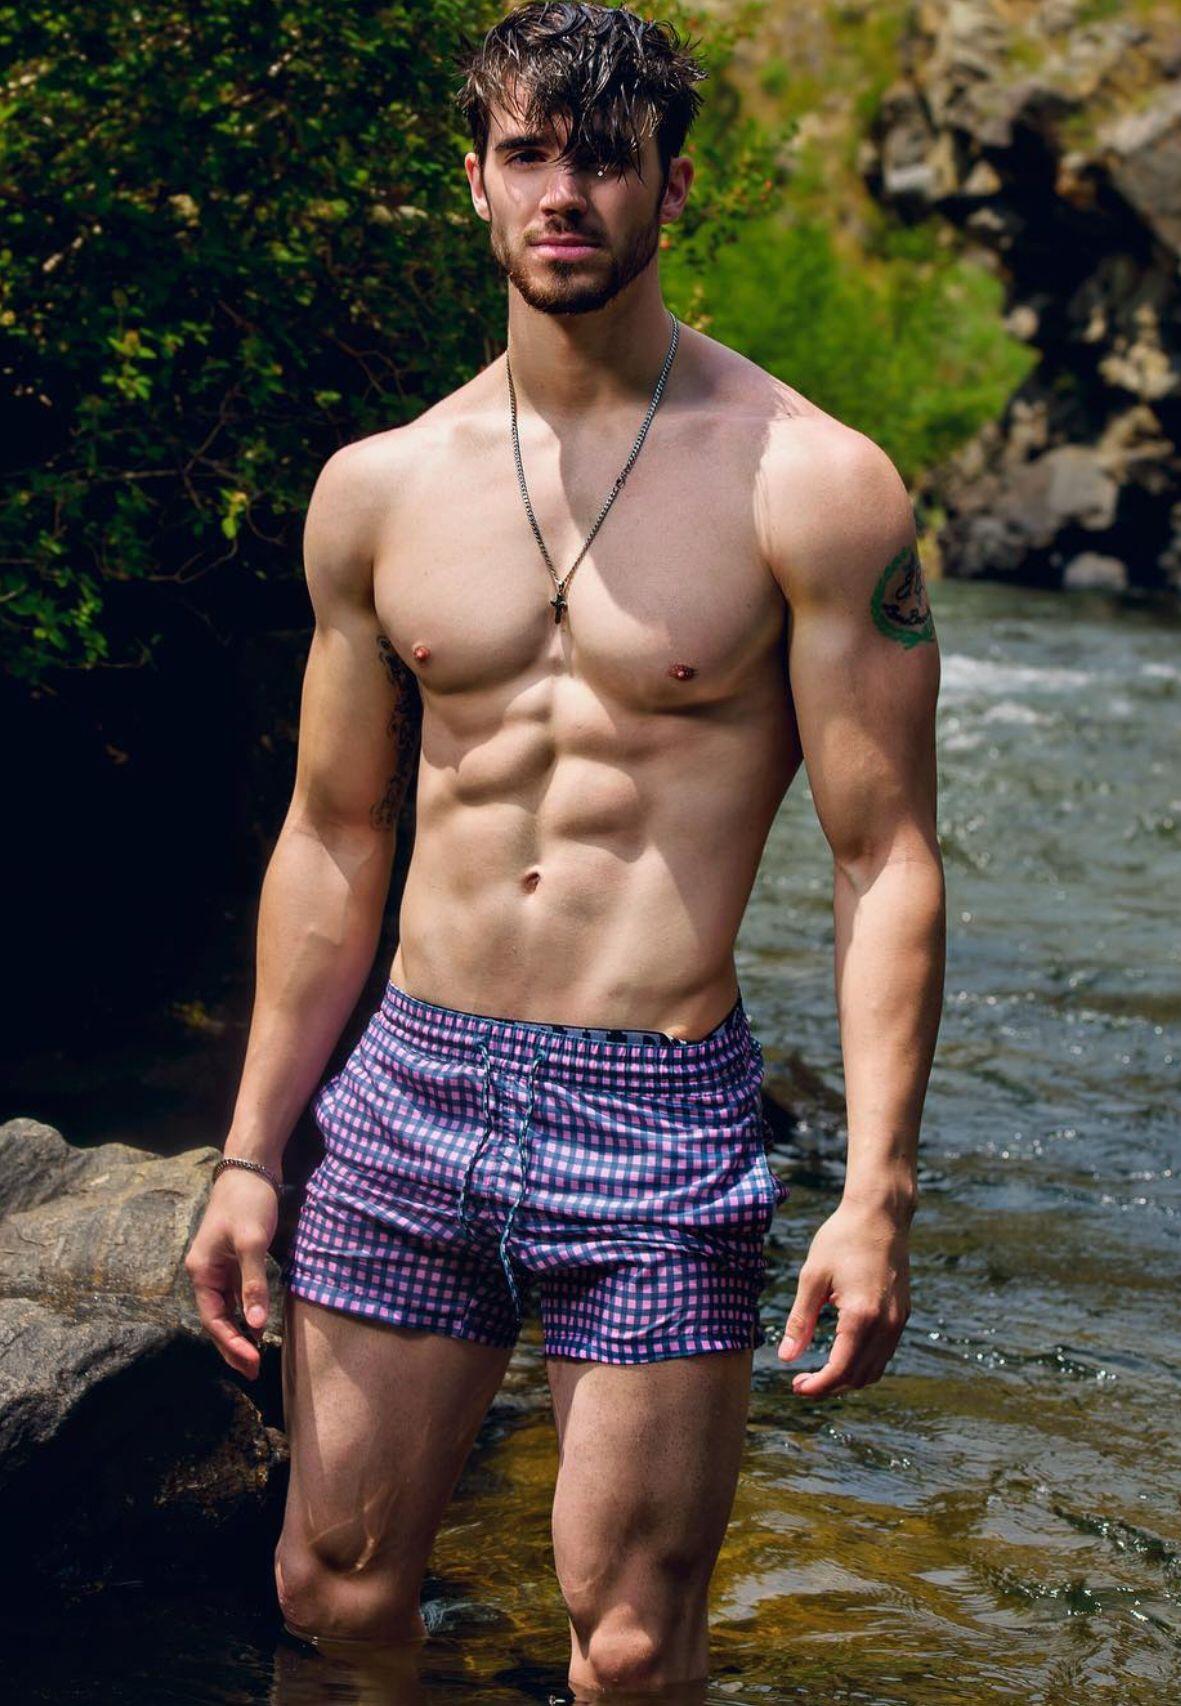 Модели парни мускулистые, четвером трахнули на мкаде онлайн видео